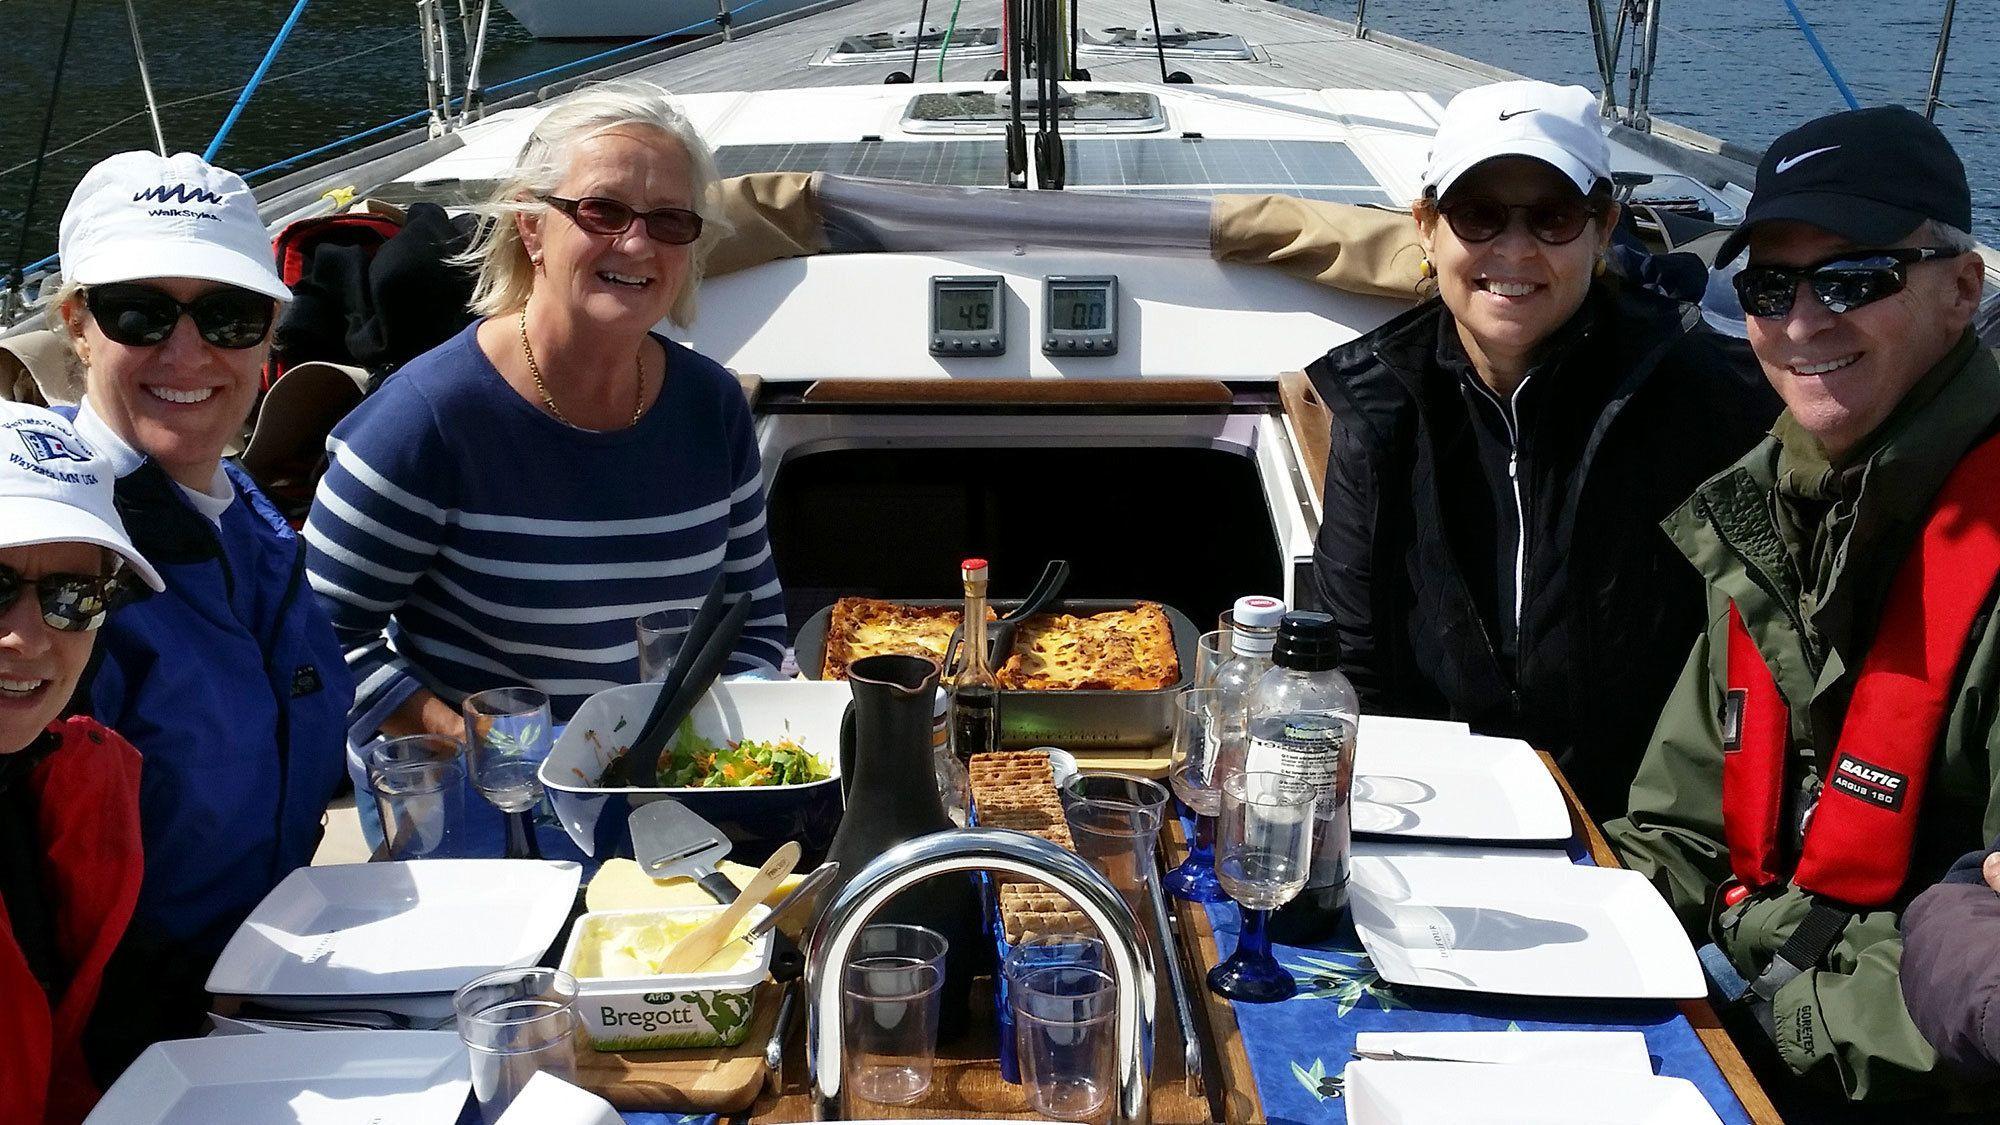 Group having meal on sailboat in Stockholm Archipelago